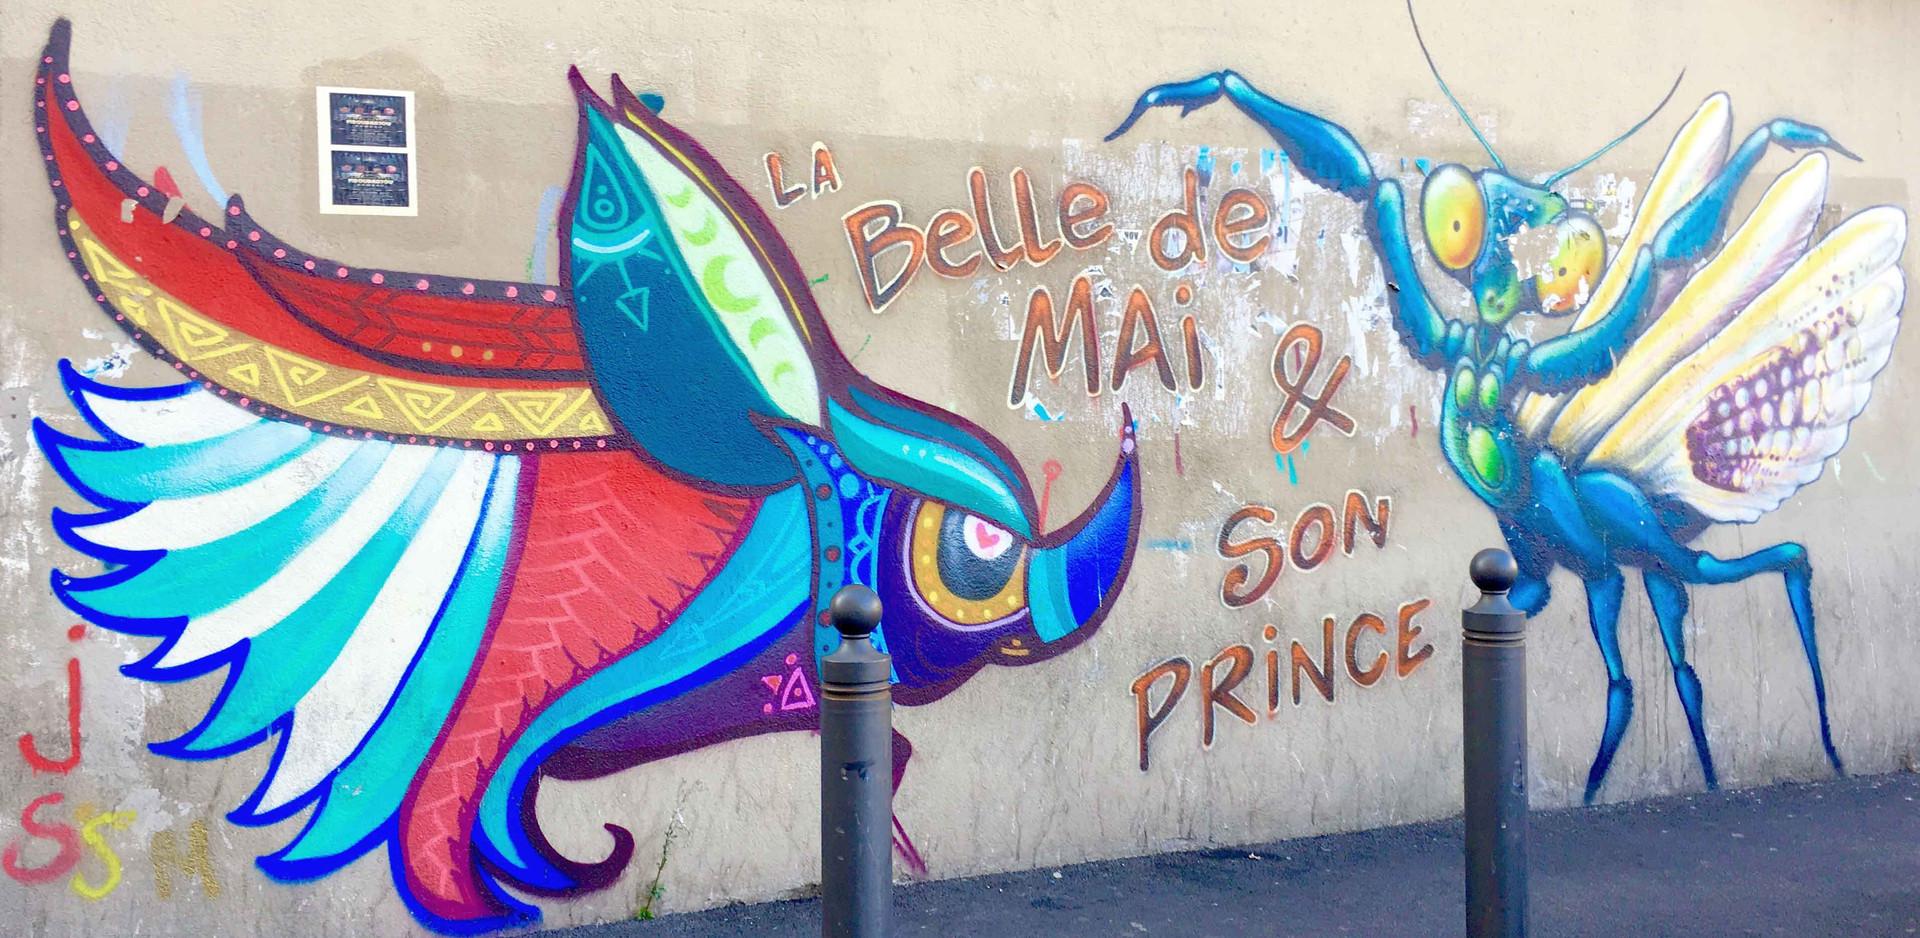 Le street art à la Belle de Mai, Marseille